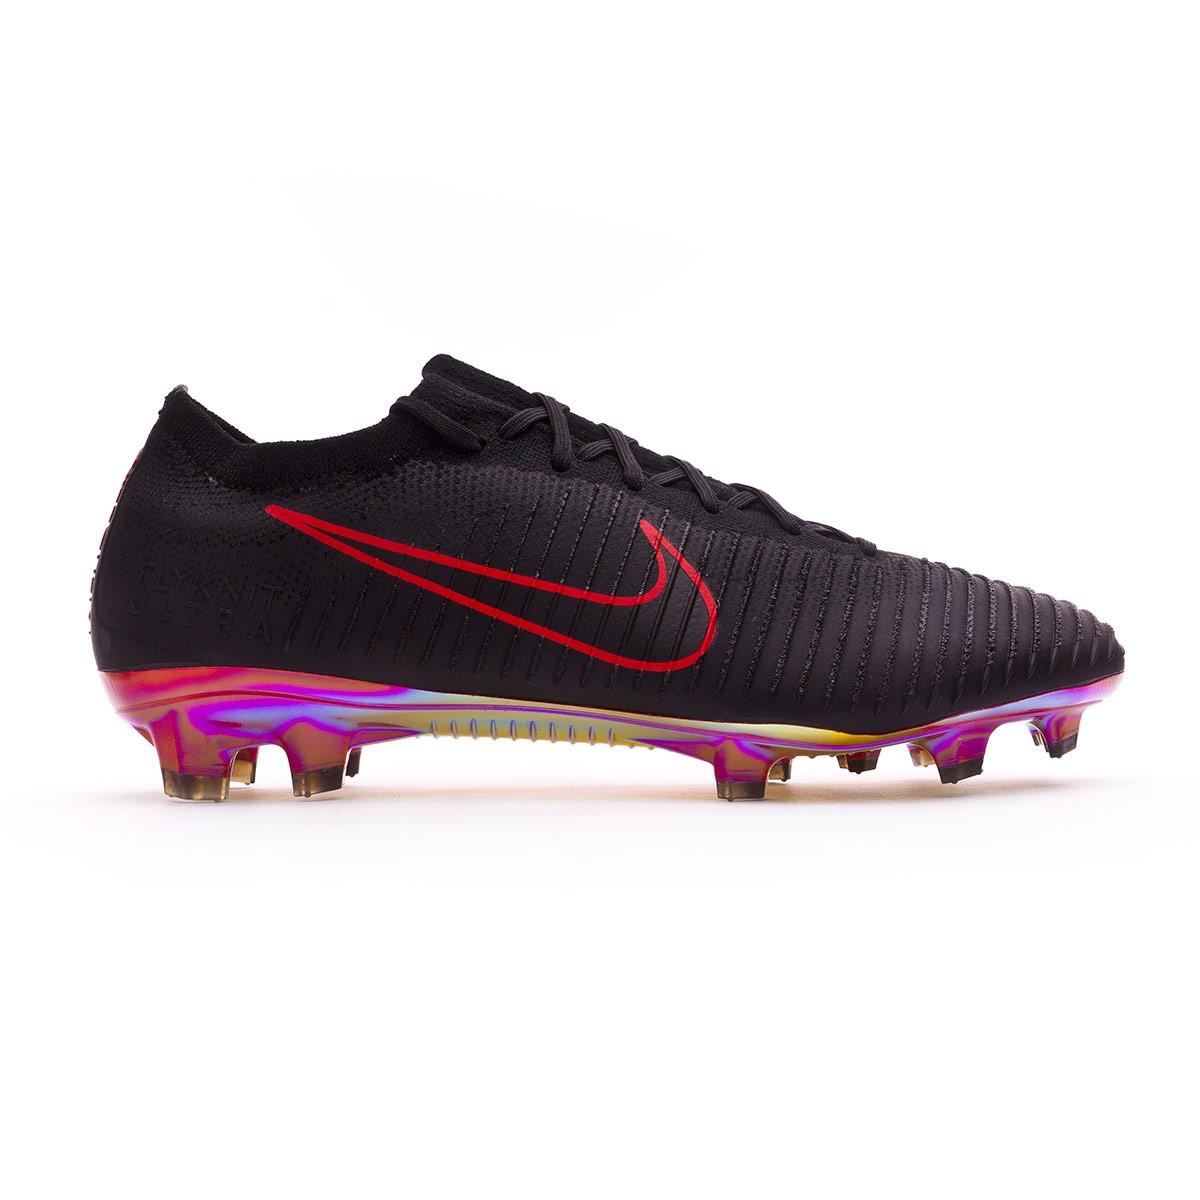 5f43e5d5e72f Football Boots Nike Mercurial Vapor Flyknit Ultra FG Black-University red -  Tienda de fútbol Fútbol Emotion